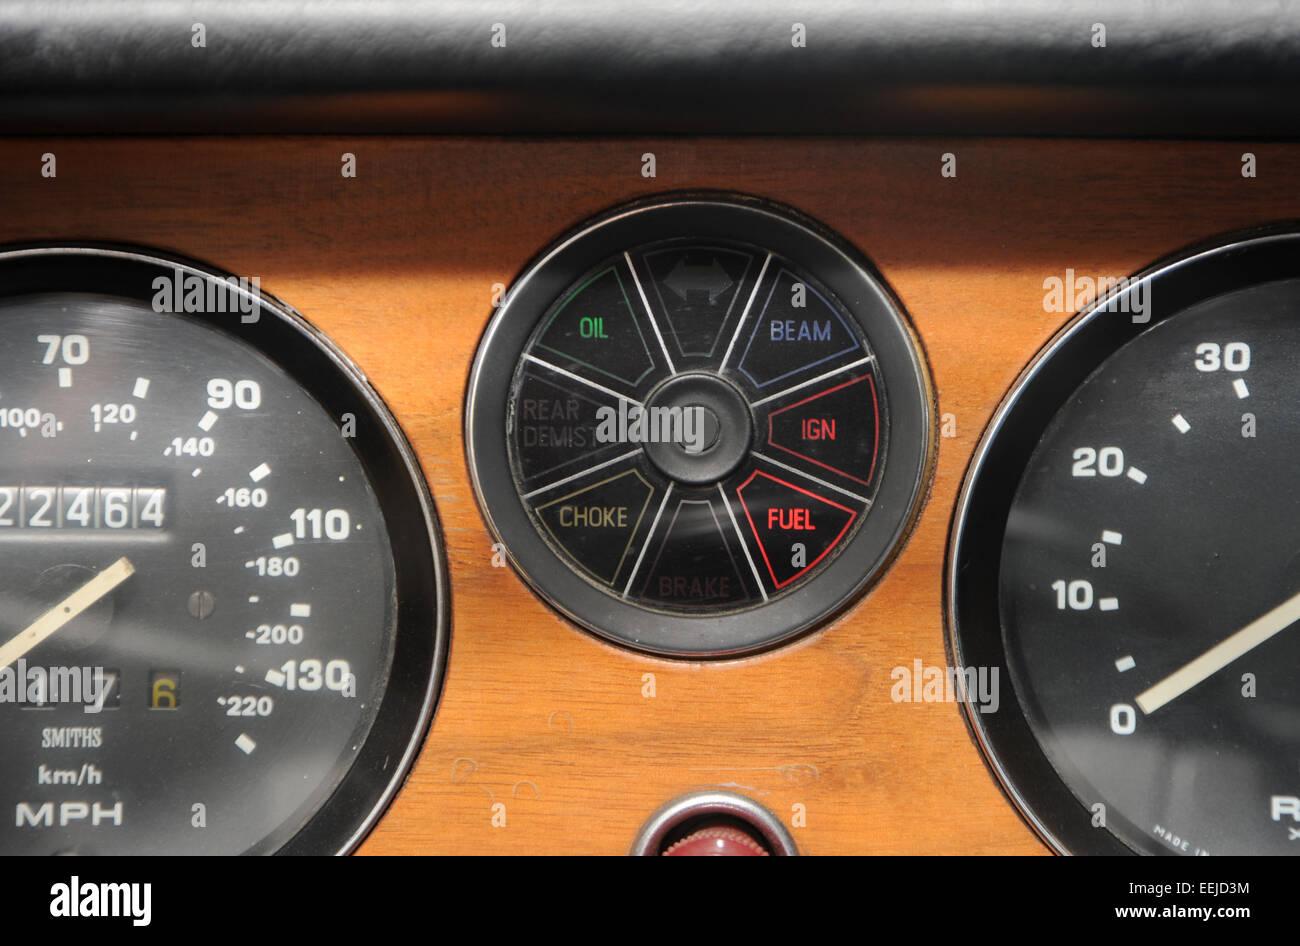 Oil Warning Light Stock Photos Images Alamy Car Headlight Alarm Beam Ingnition Ign Fuel And Choke